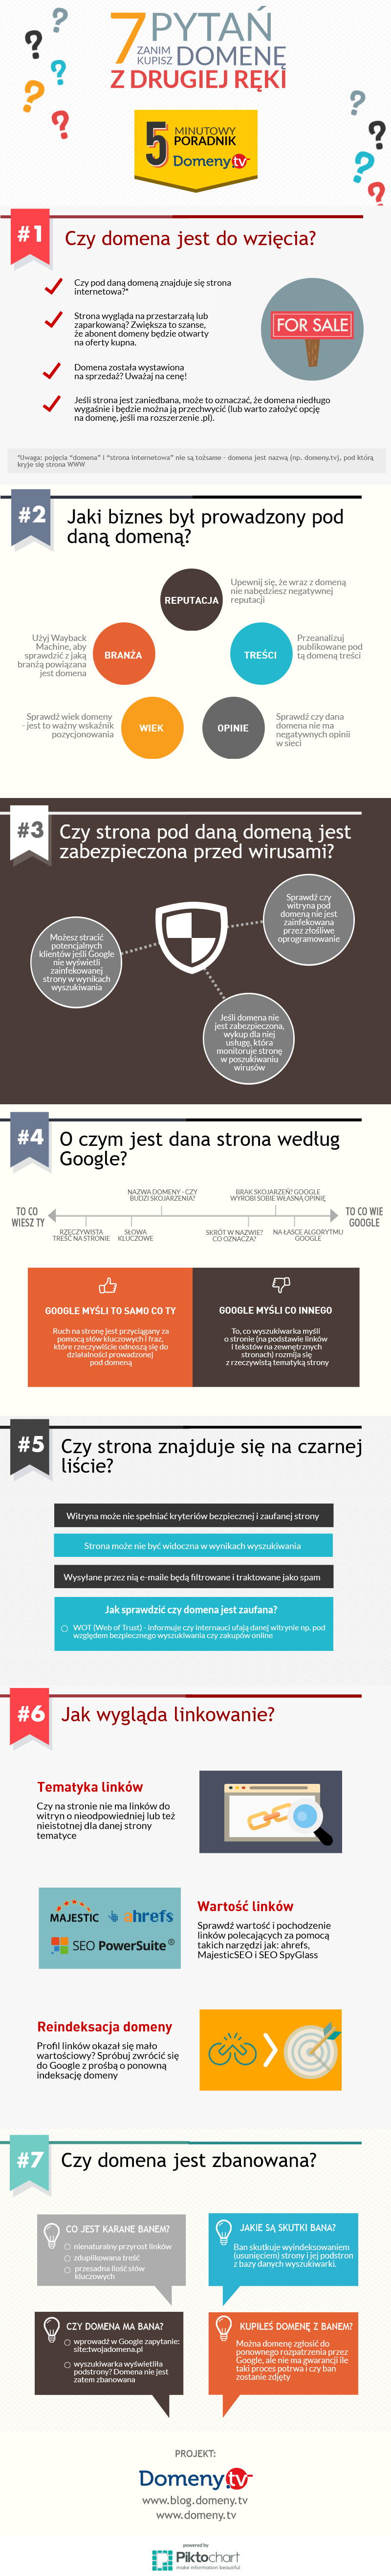 Kupno domeny z drugiej ręki [infografika]